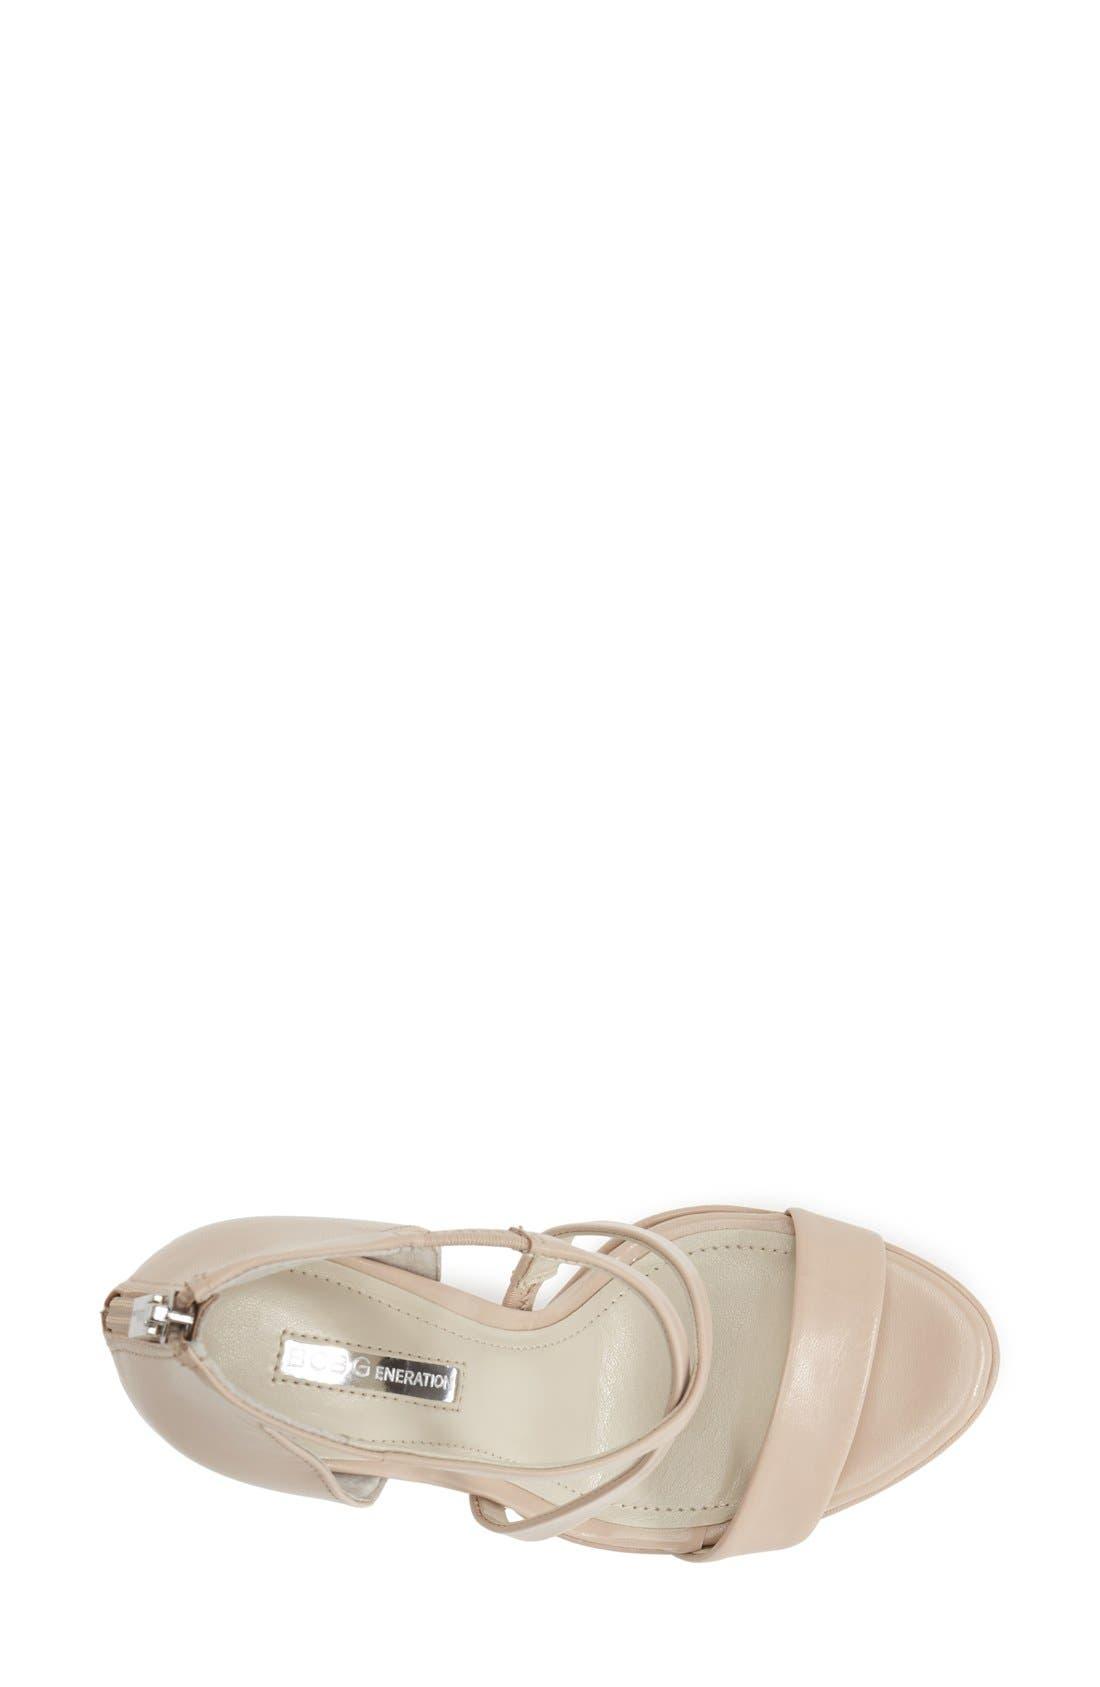 Alternate Image 3  - BCBGeneration 'Gidget' Leather Platform Sandal (Women)